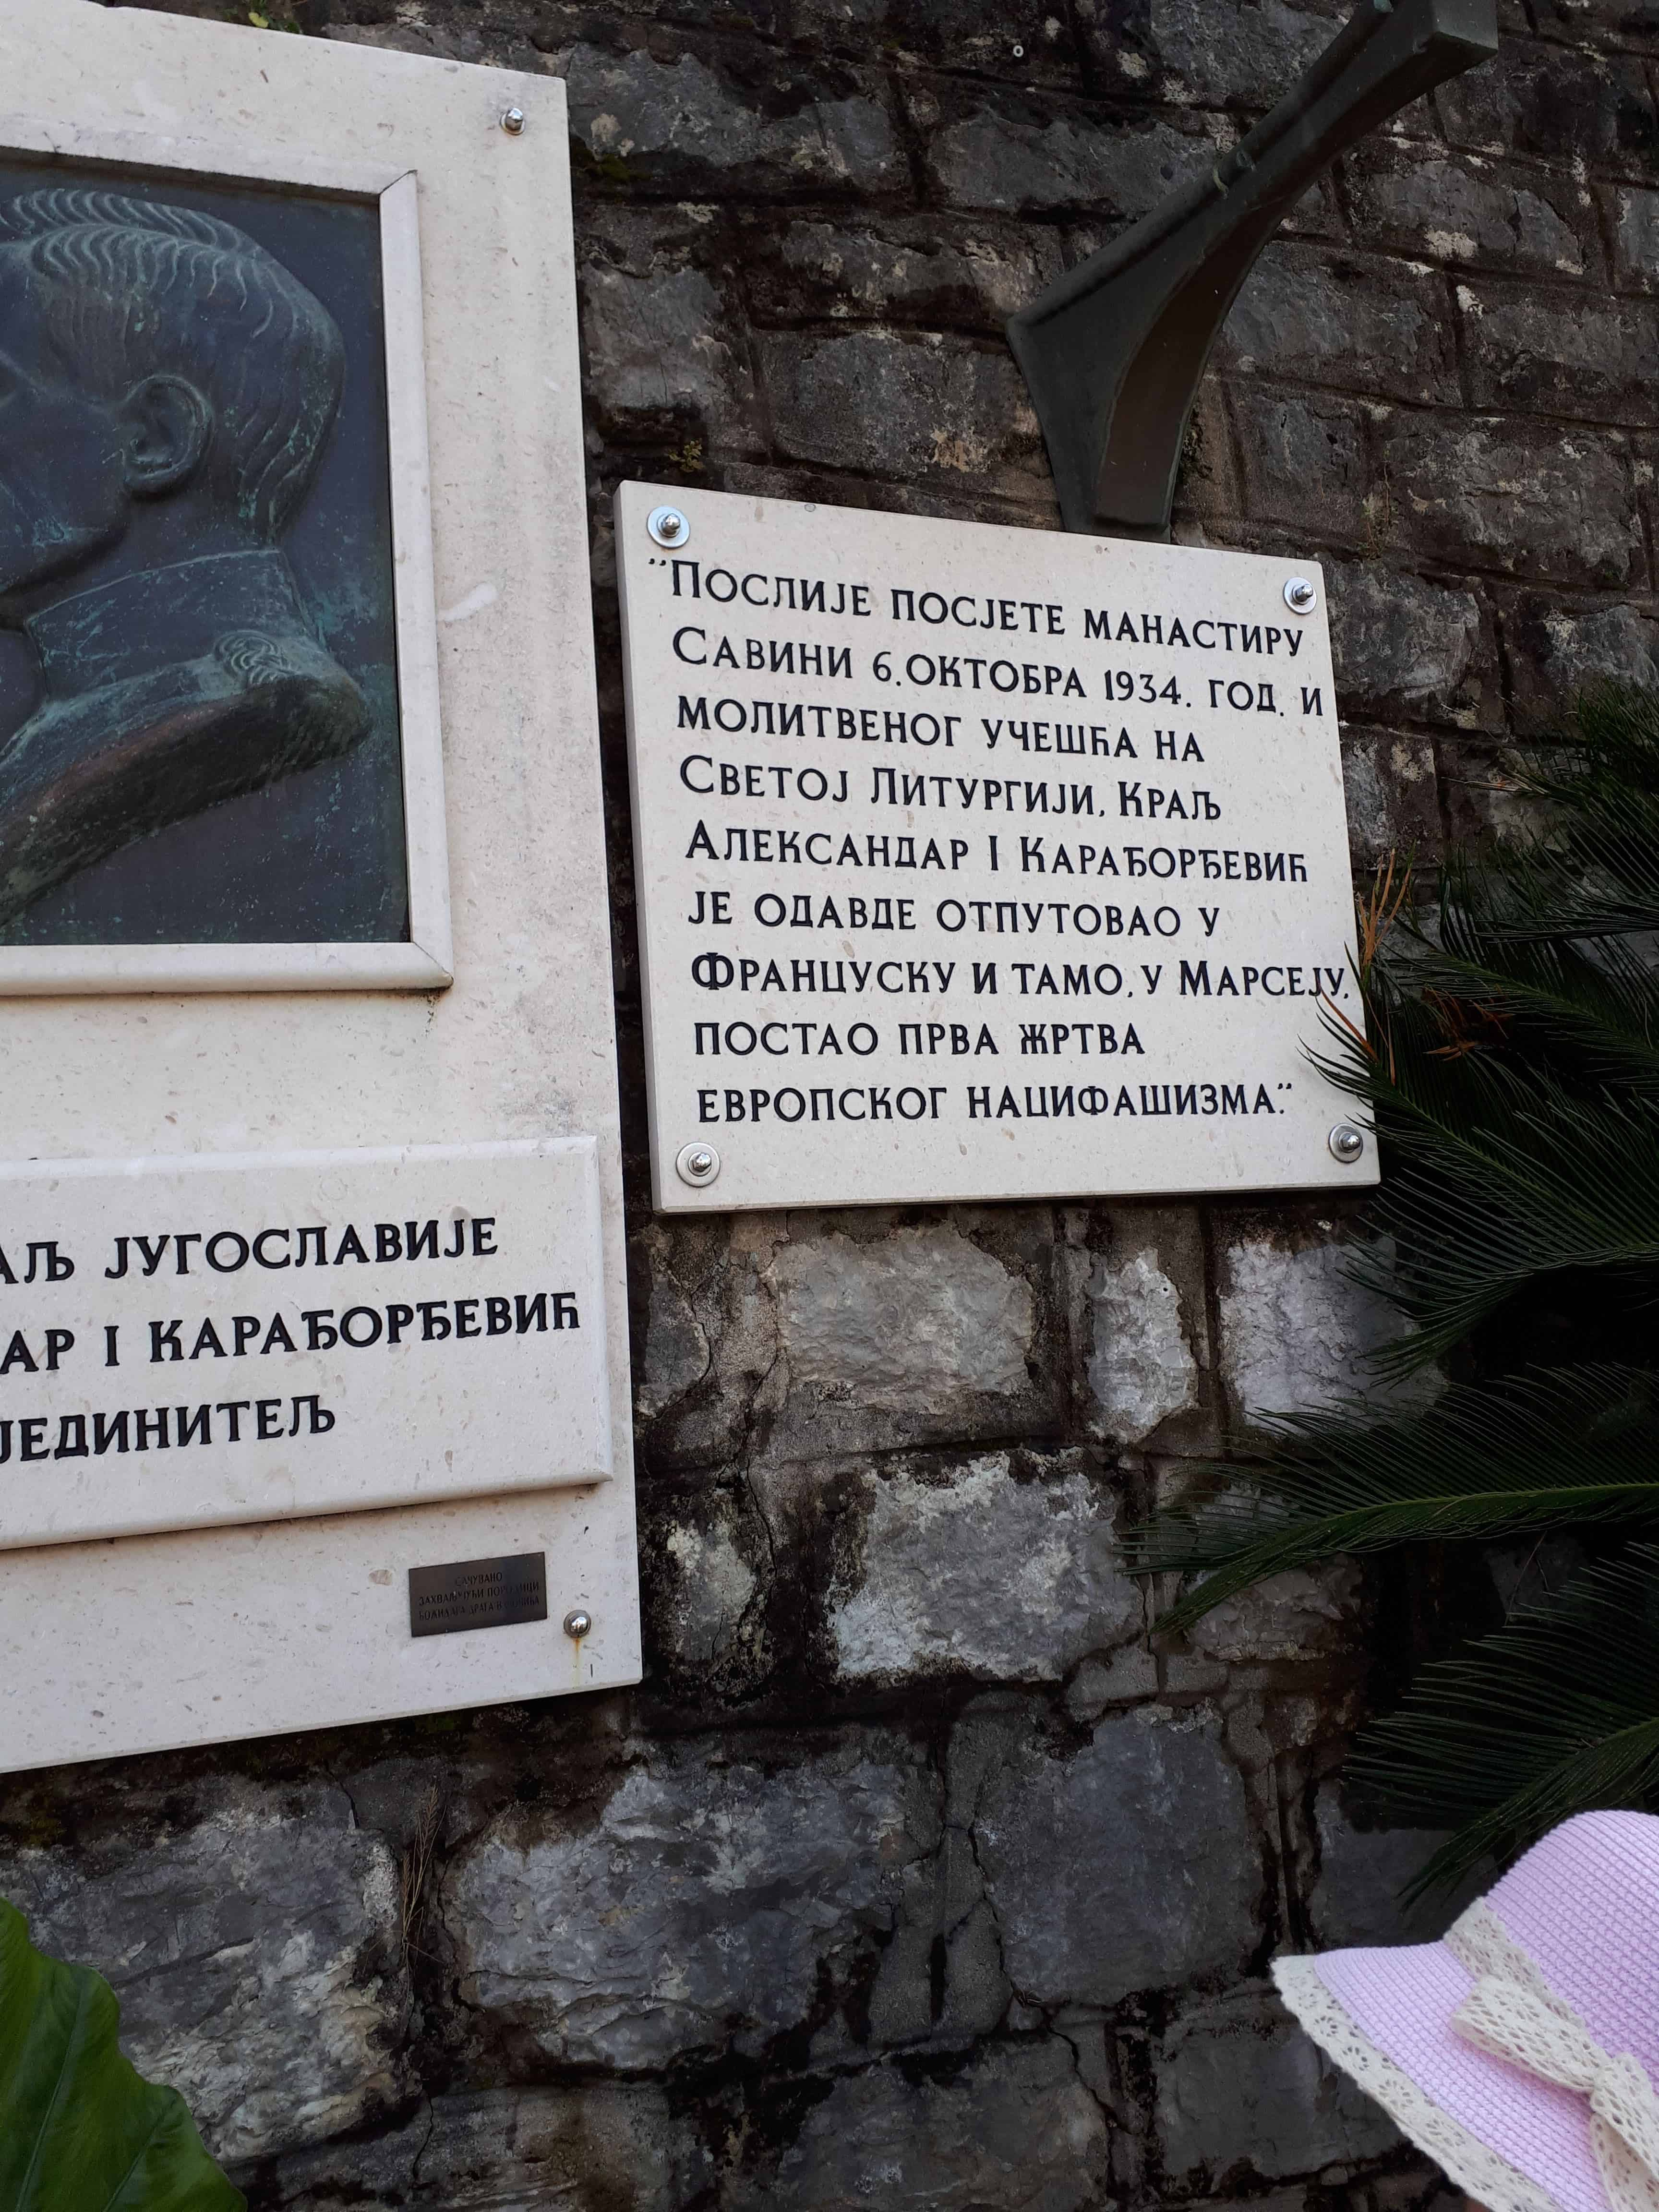 Manastir Savina Kralj Aleksandar Karadjordjevic